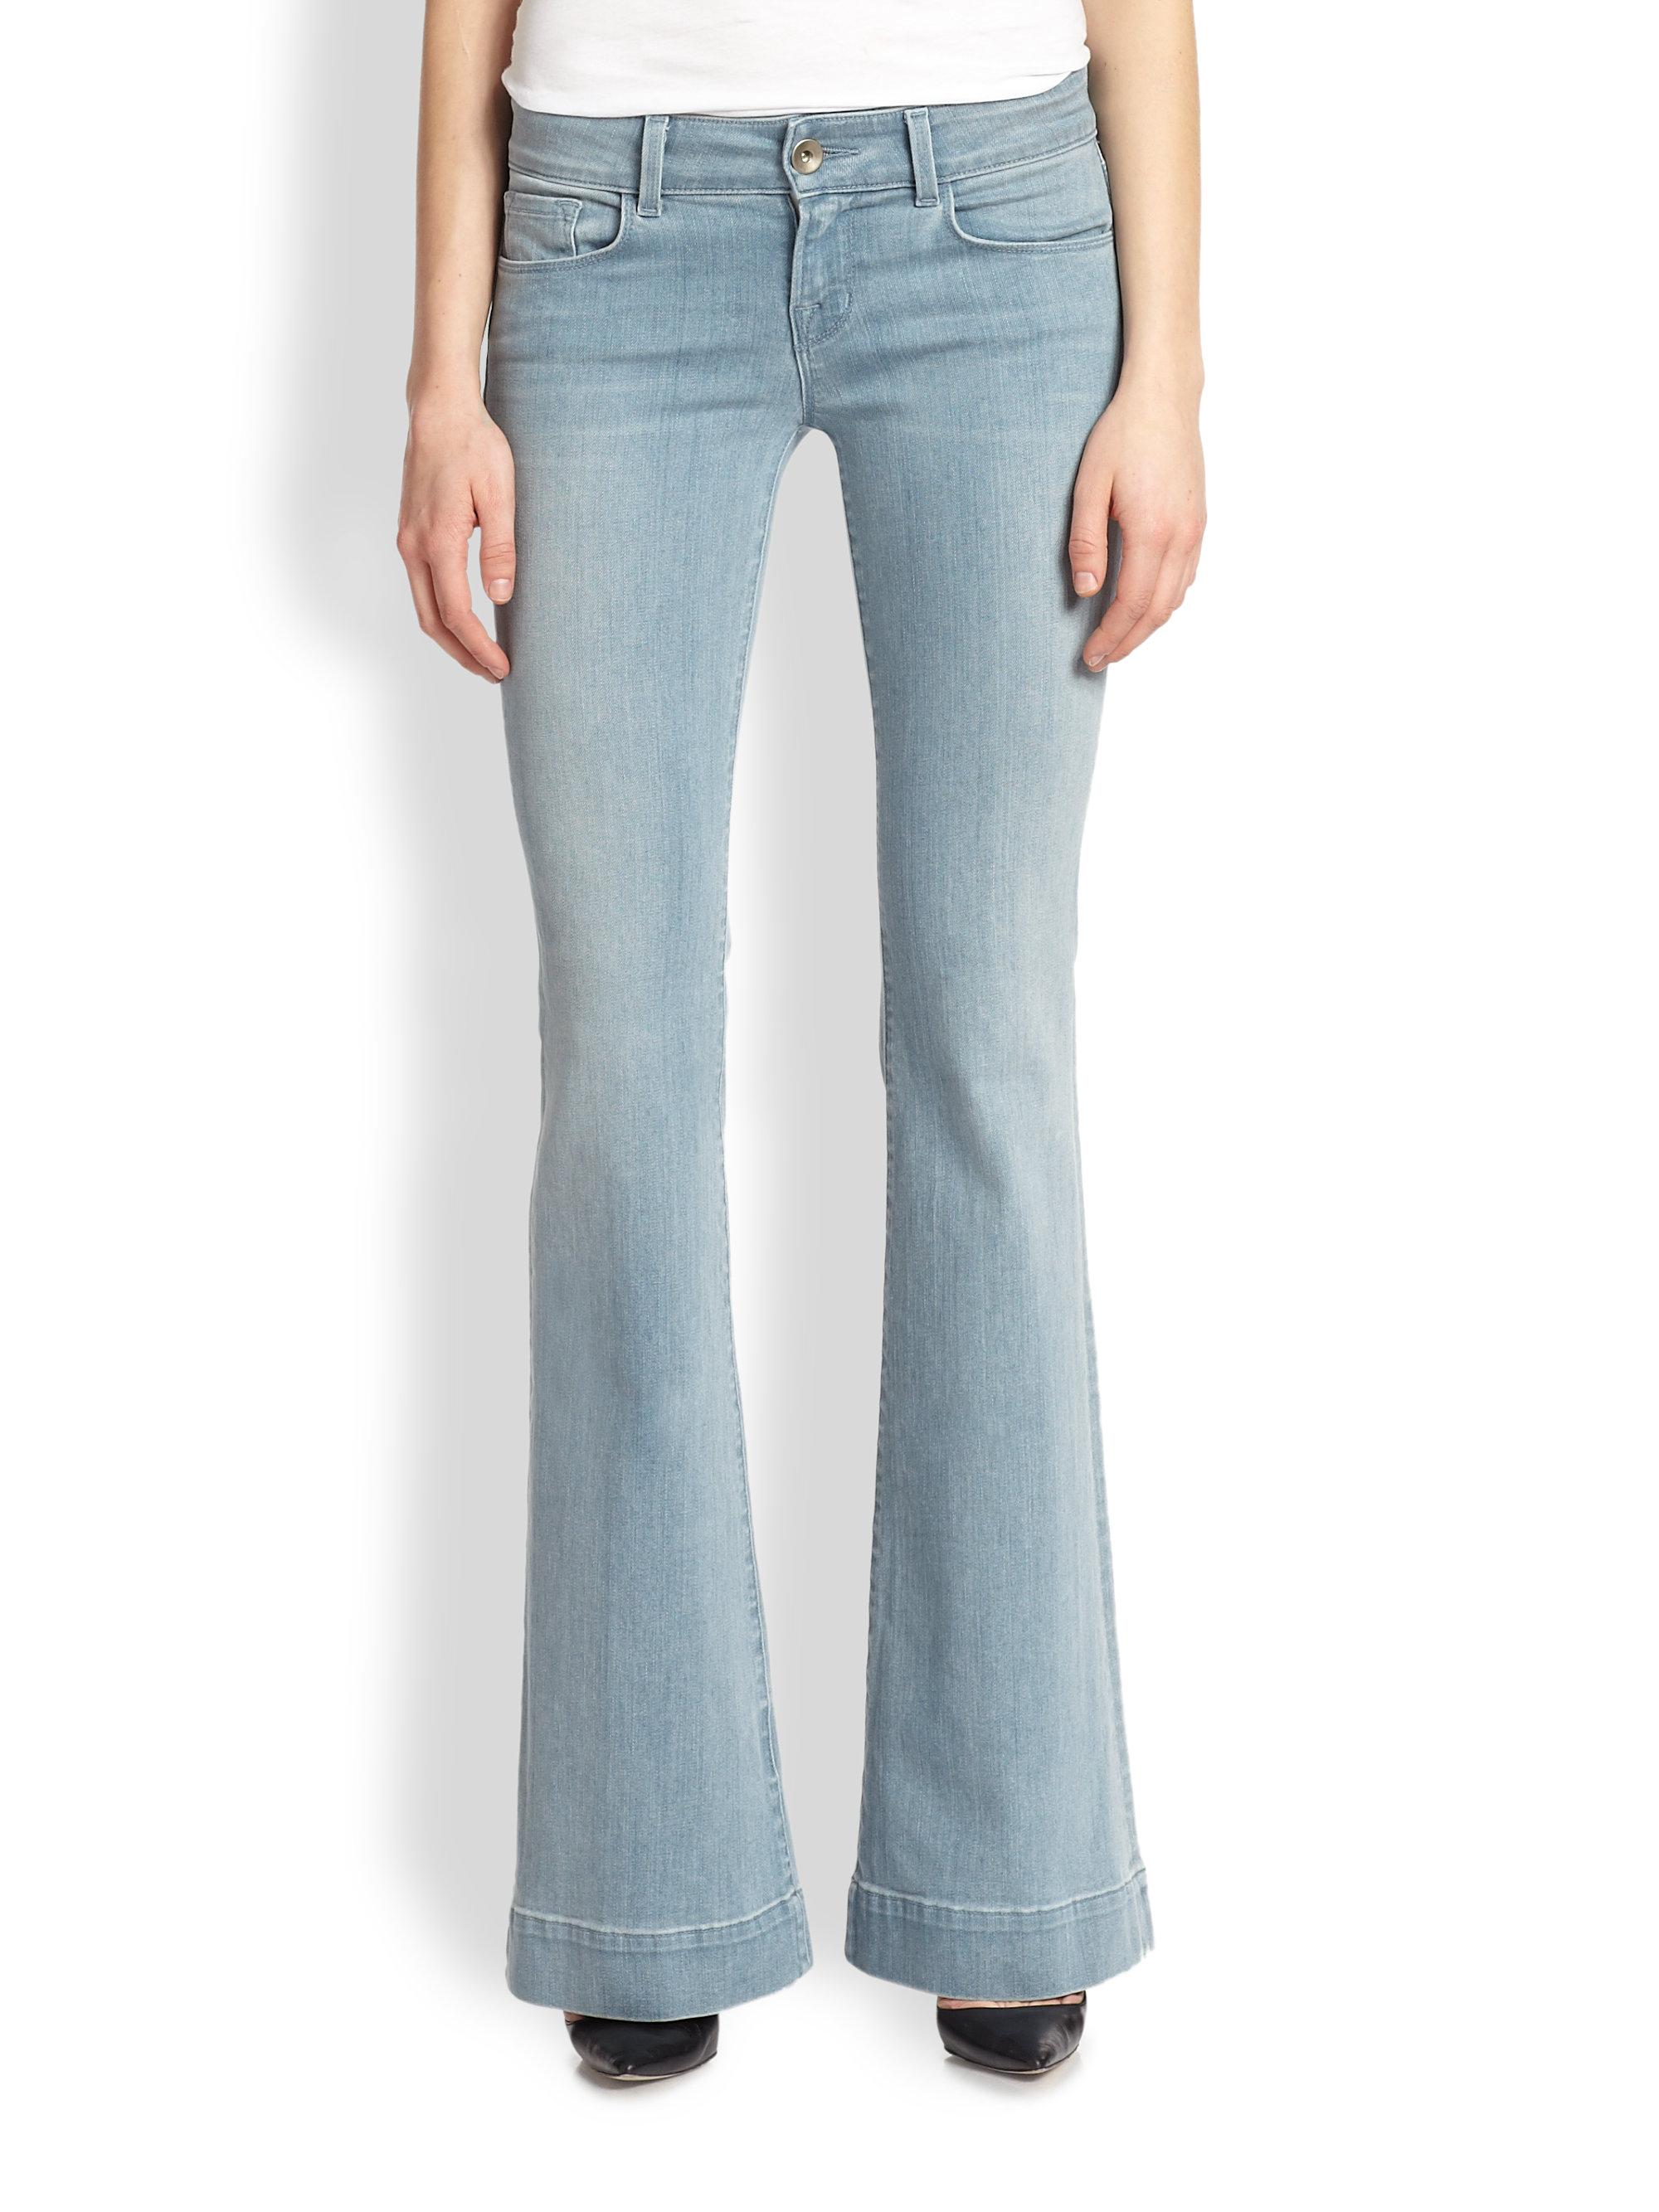 j brand lovestory flared jeans in blue palladium lyst. Black Bedroom Furniture Sets. Home Design Ideas